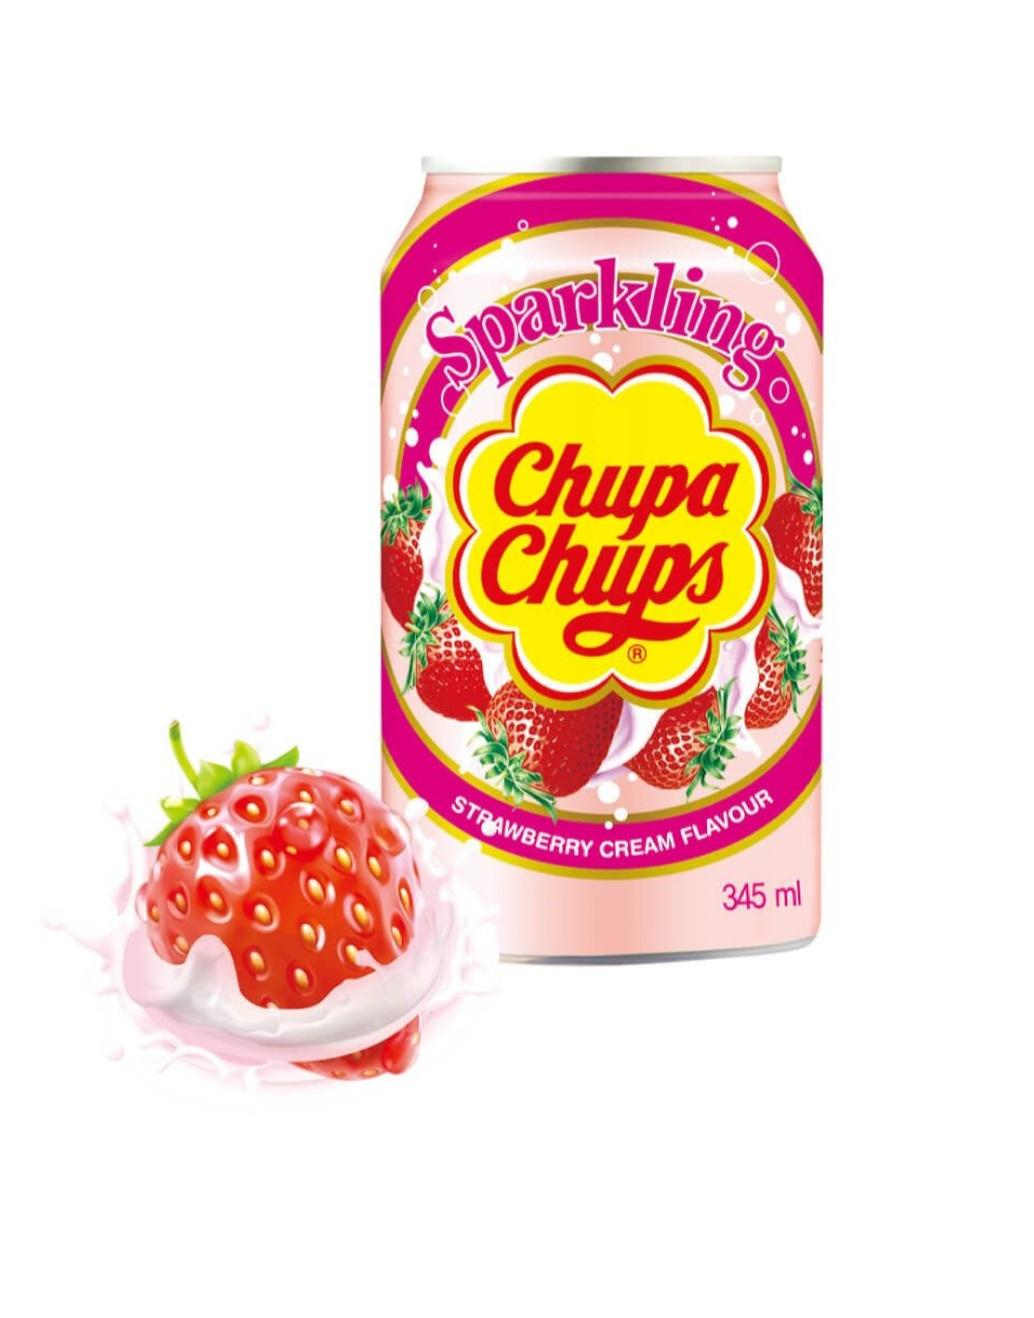 CHUPA CHUPS SPARKLING STRAWBERRY CREAM 250ML